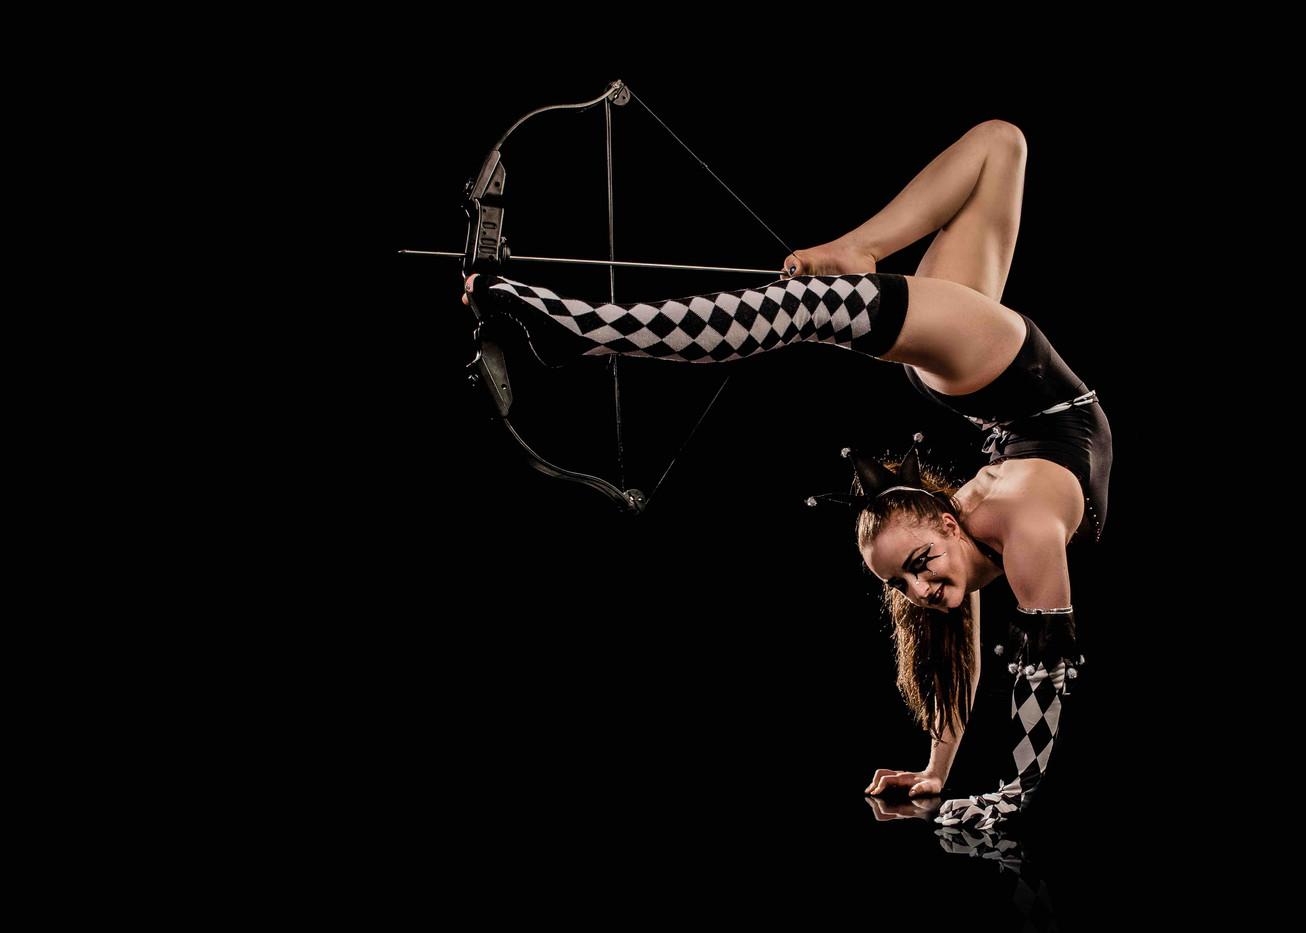 Broken circus foot archery.jpg